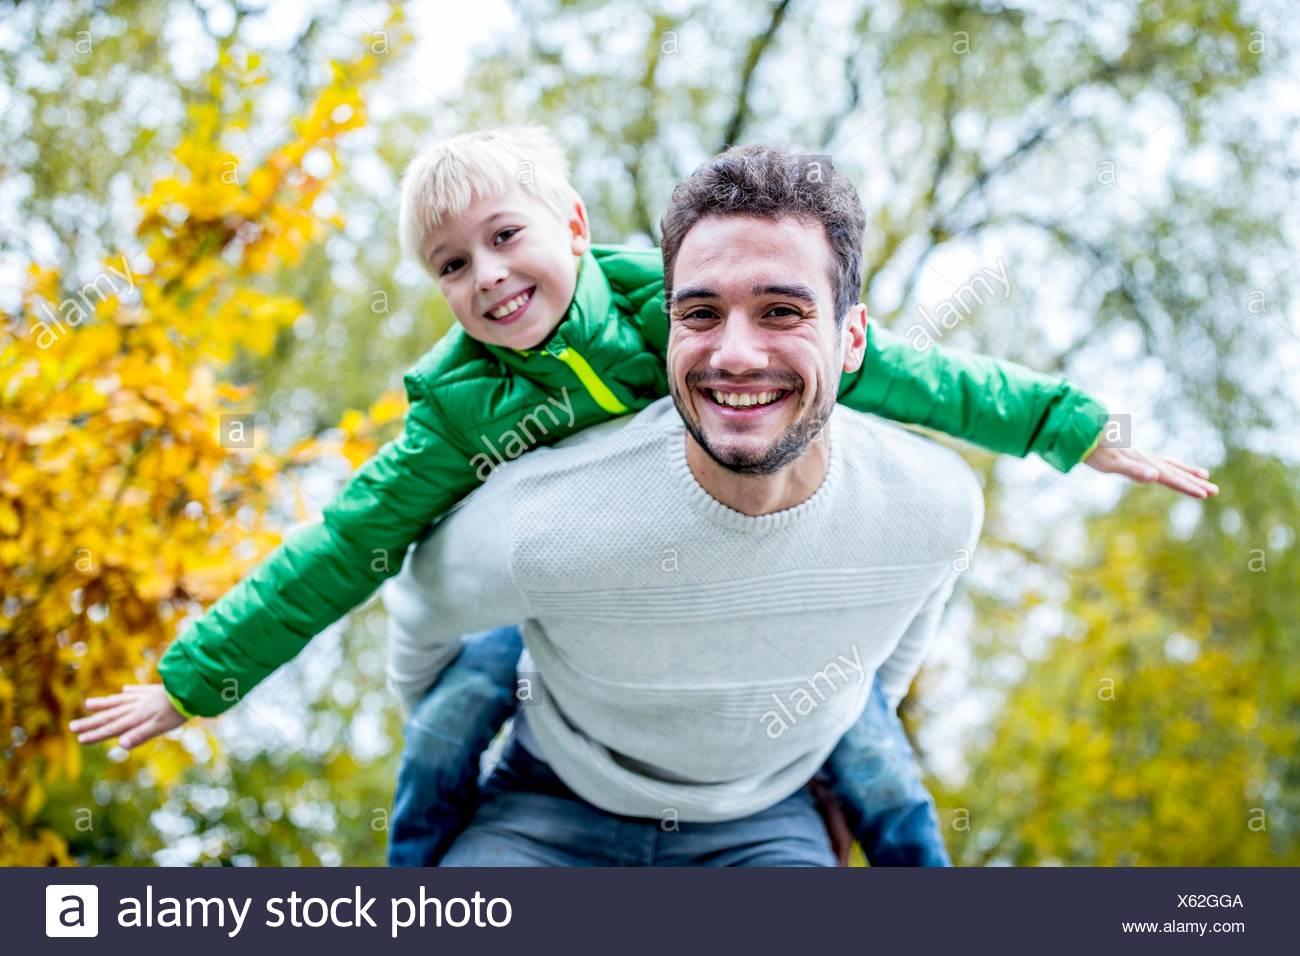 -MODELL VERÖFFENTLICHT. Vater mit Sohn Huckepack im Herbst, Lächeln, Porträt. Stockbild